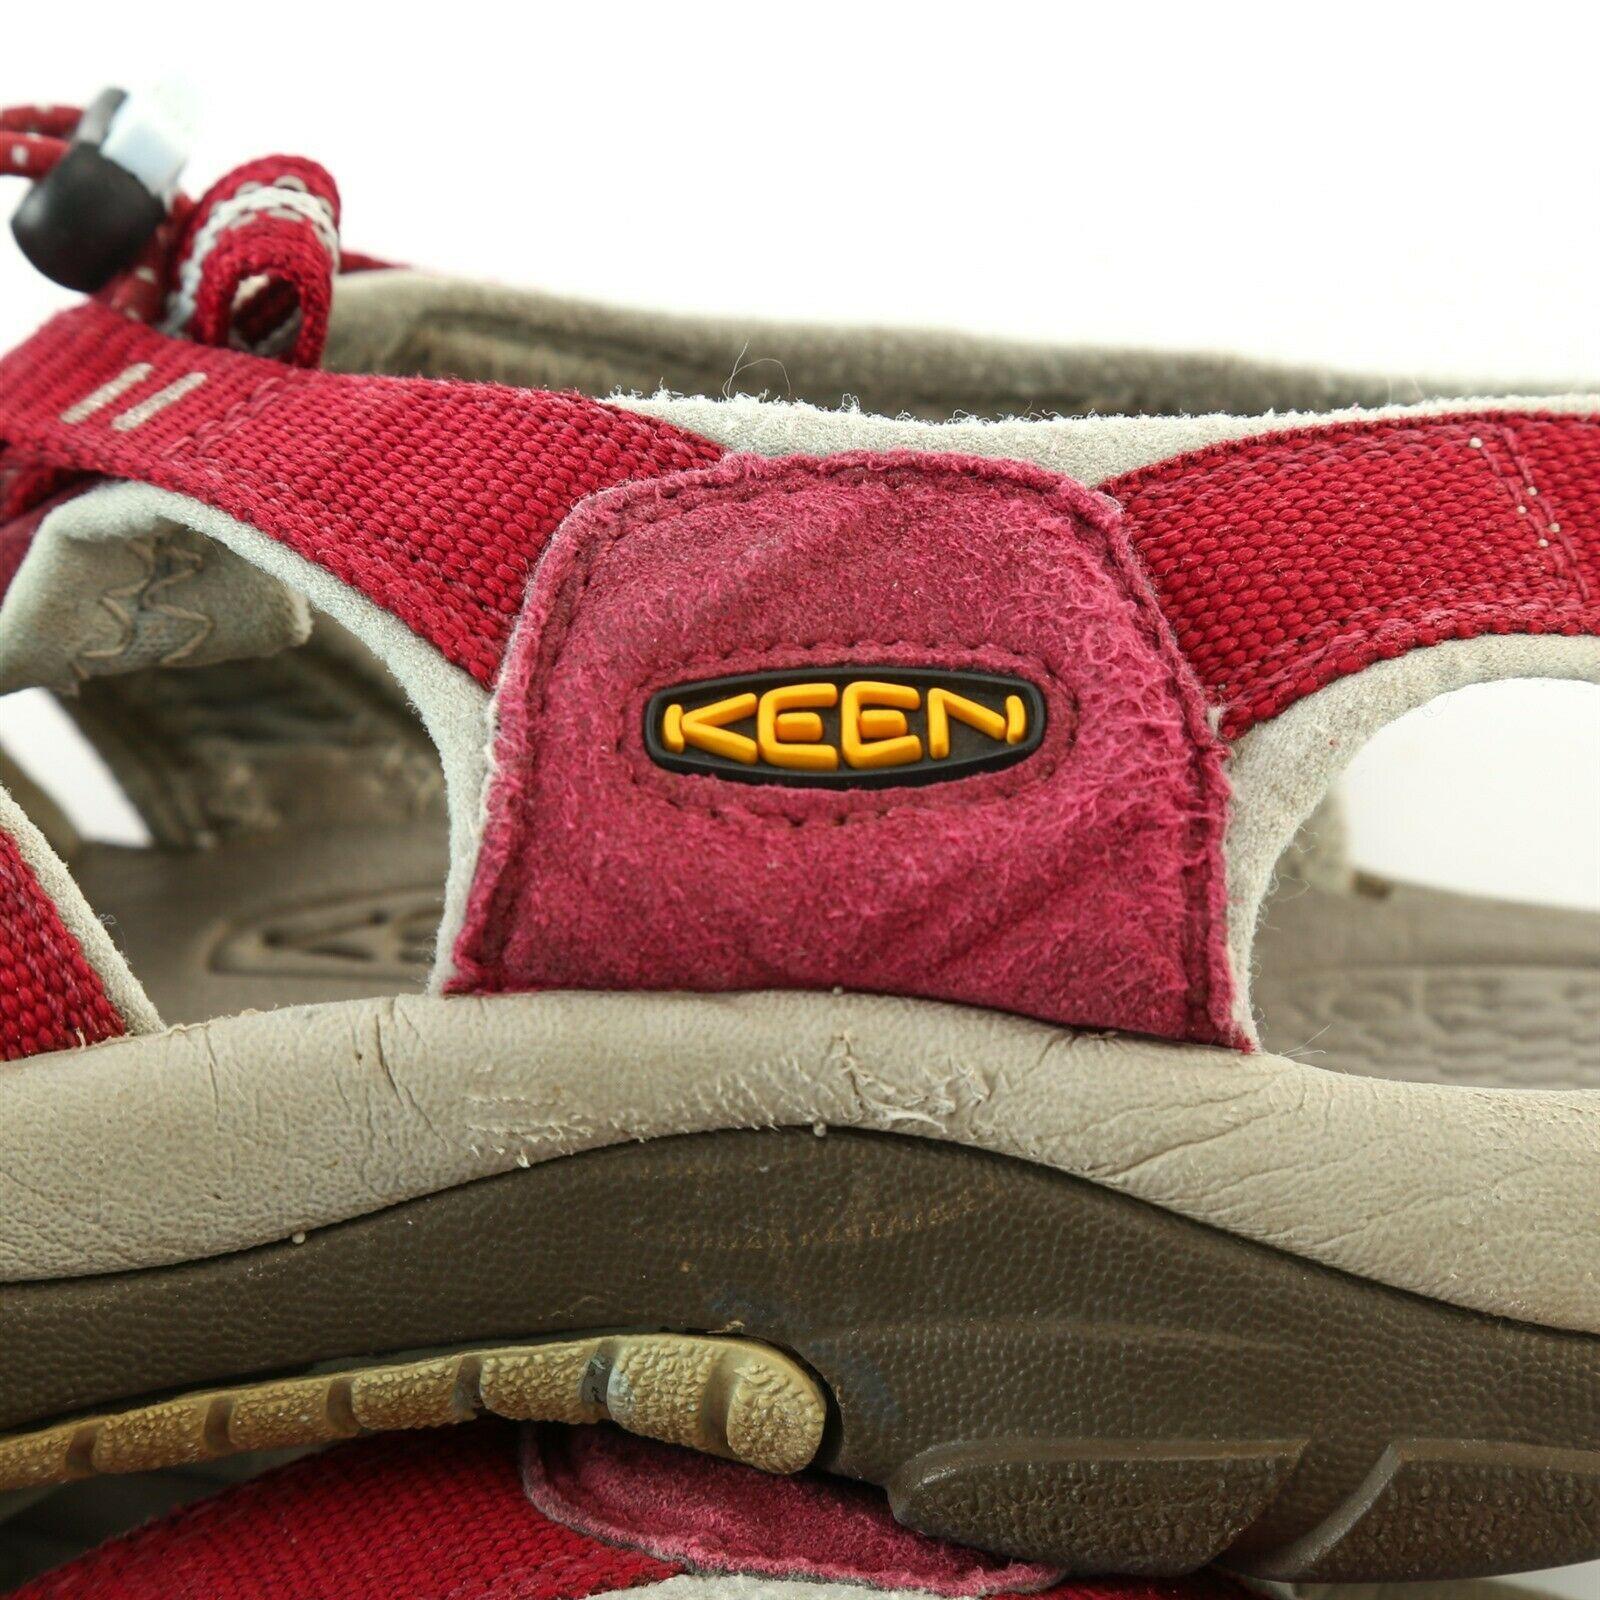 Keen Hiking Sport Sandals Trail Outdoor Shoes Waterproof Womens 9 Dark Mauve